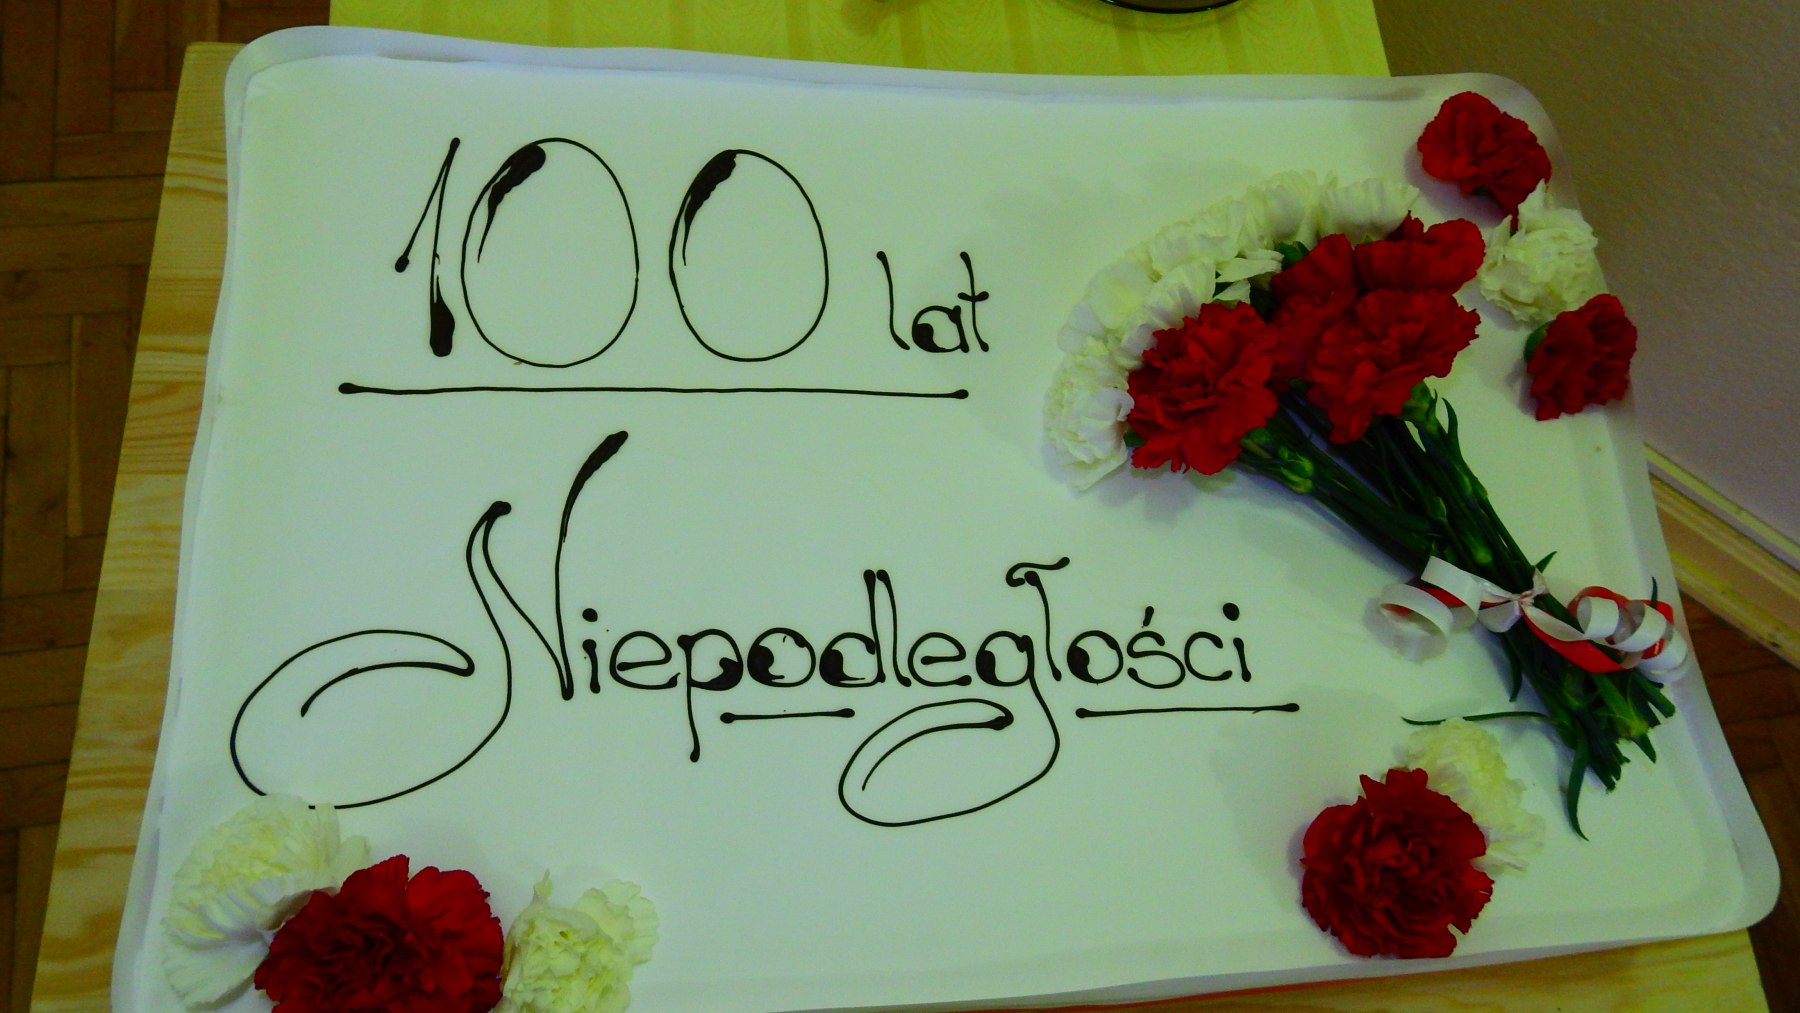 100niepodleglosc55